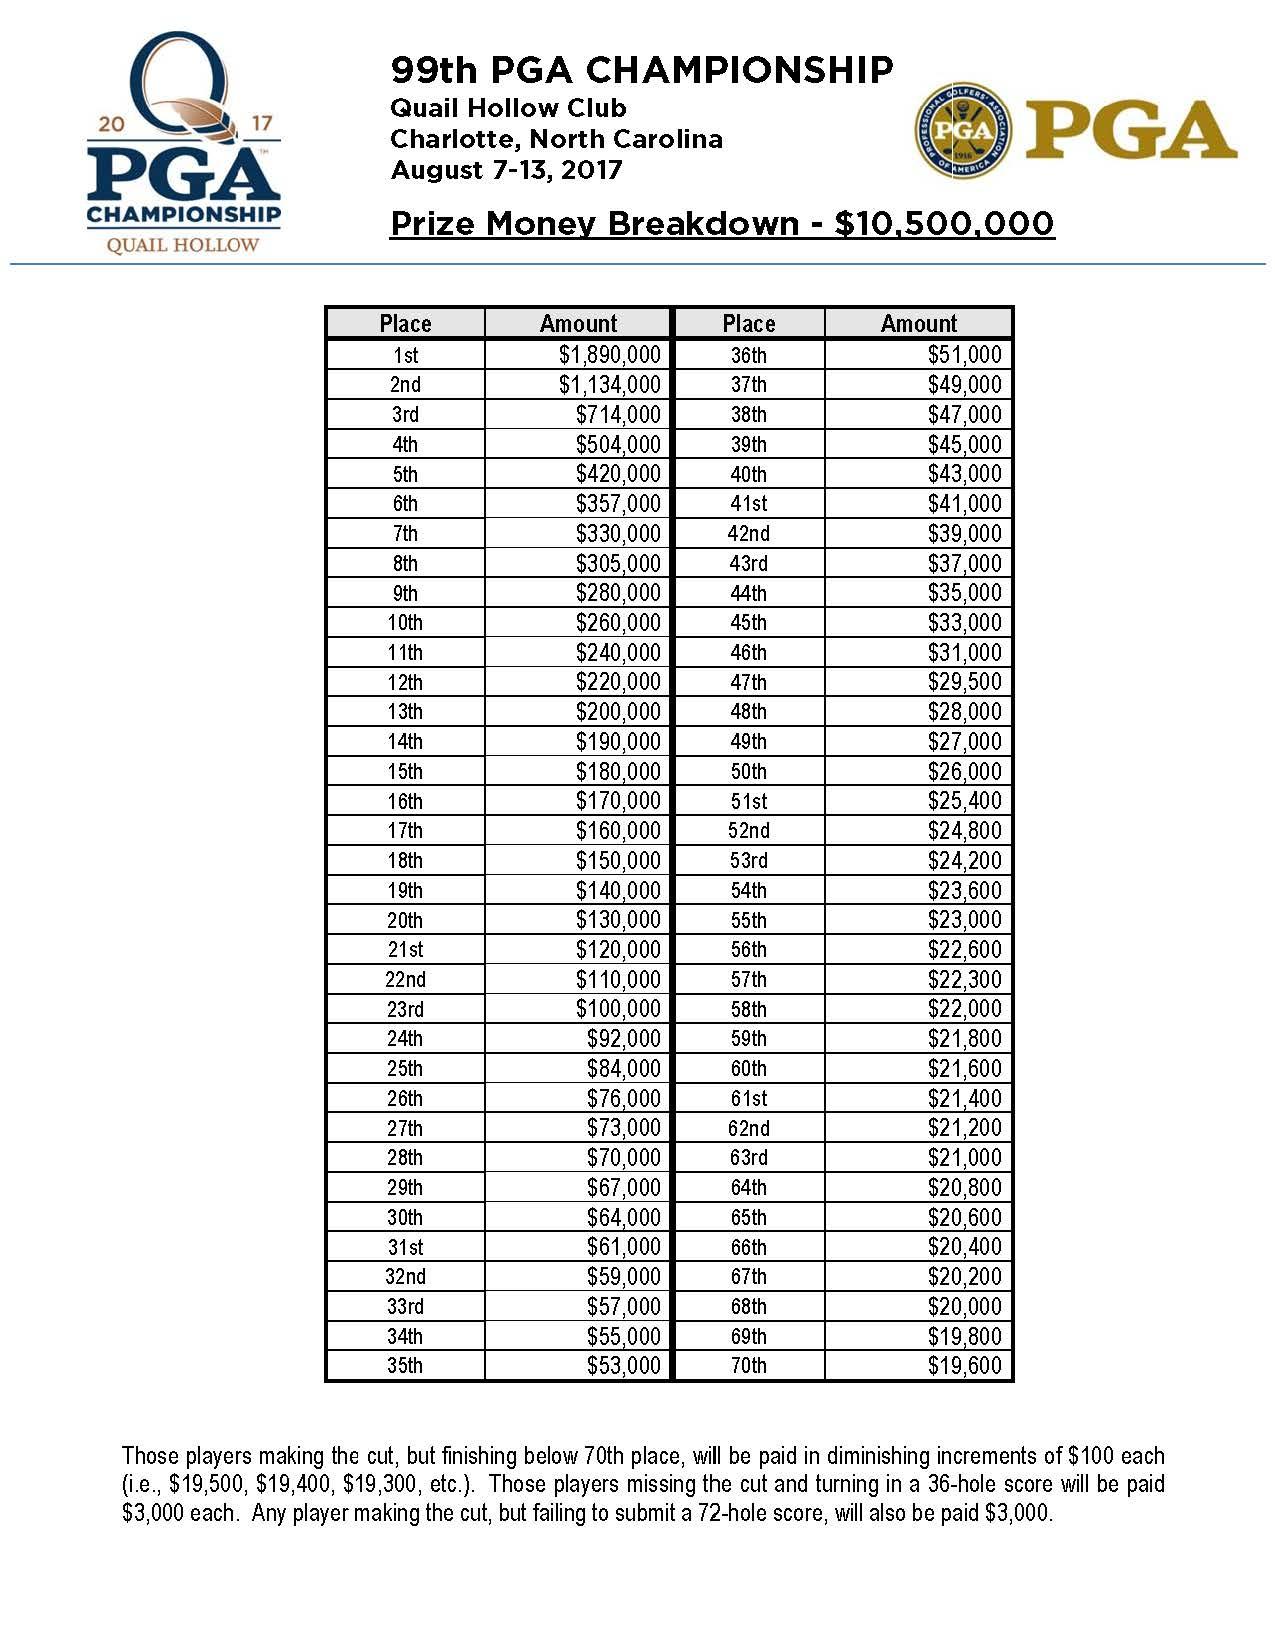 Pga Tour Championship Money Breakdown